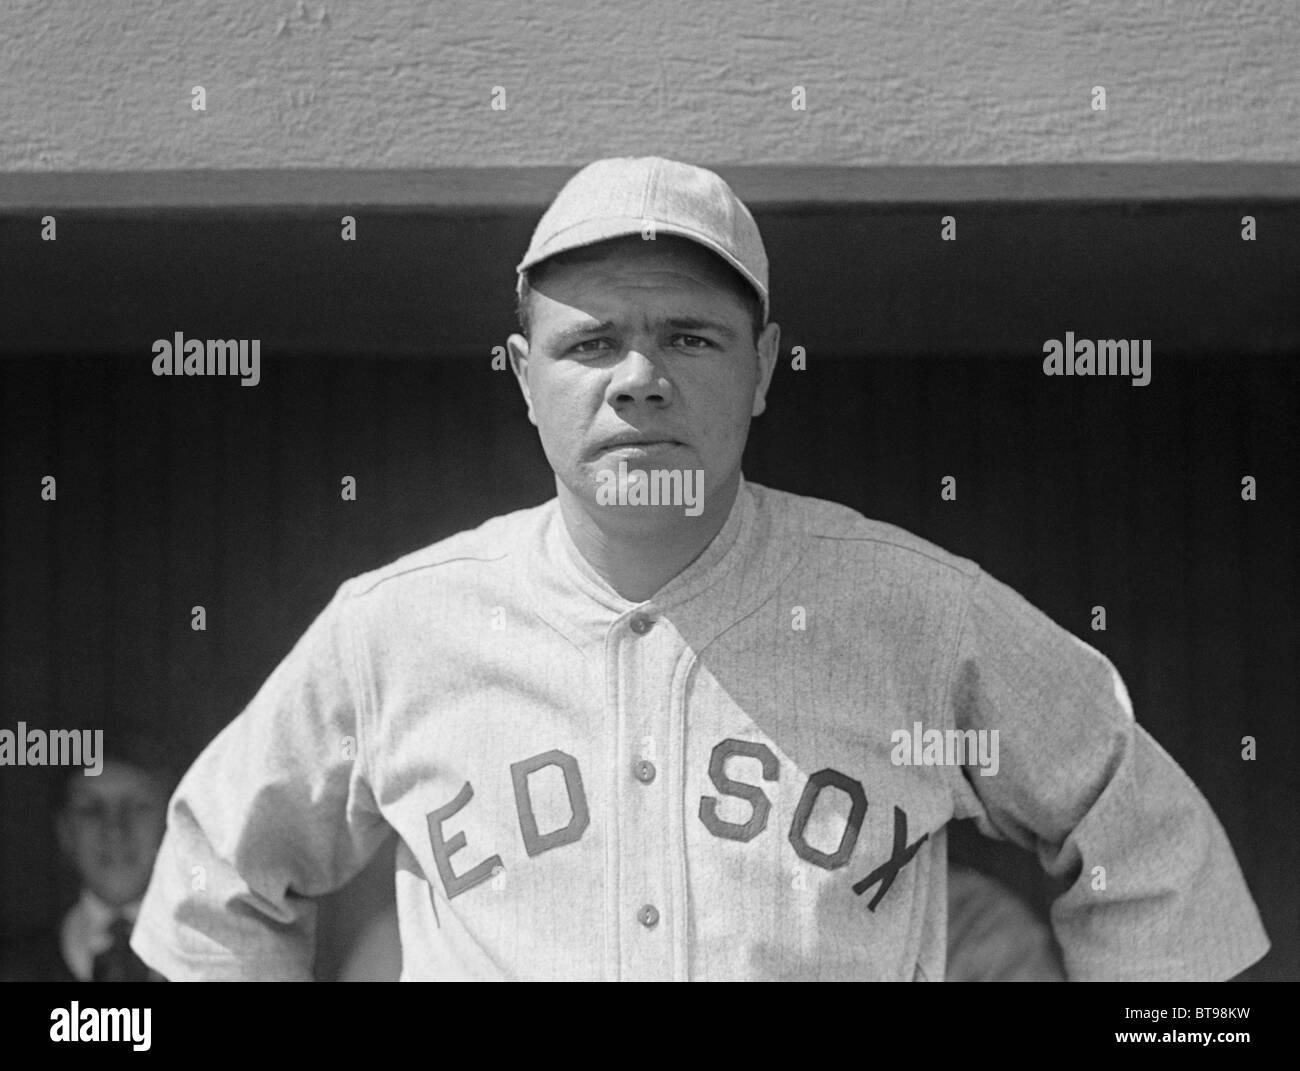 861683a66ba Vintage photo circa 1919 of baseball legend Babe Ruth (George Herman Ruth  Jr) in